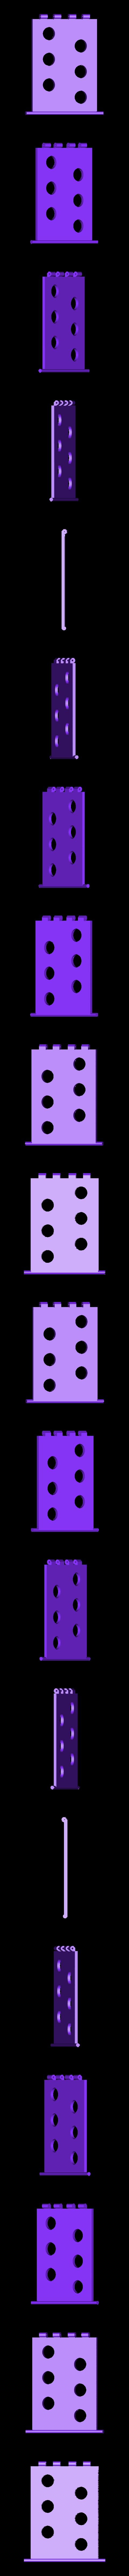 CritterRamp.stl Download free STL file Critter Rescue Ramp Modified For Smaller Printer • 3D printer object, MeesterEduard